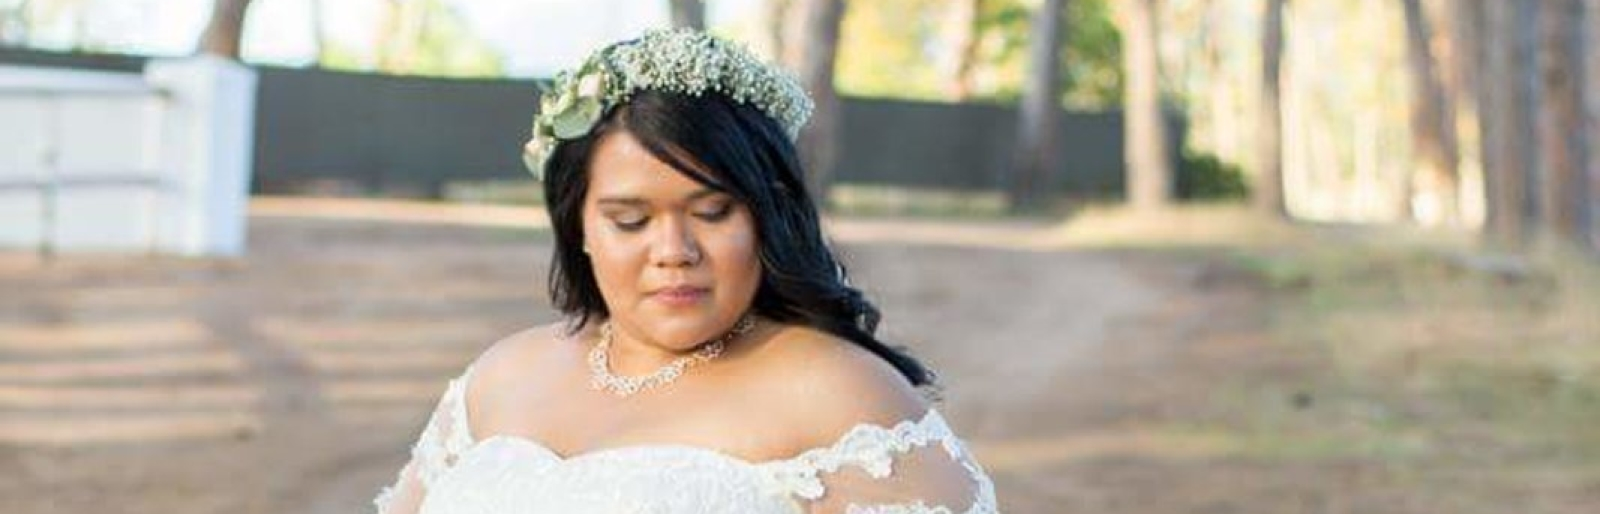 Kerstin Domingo